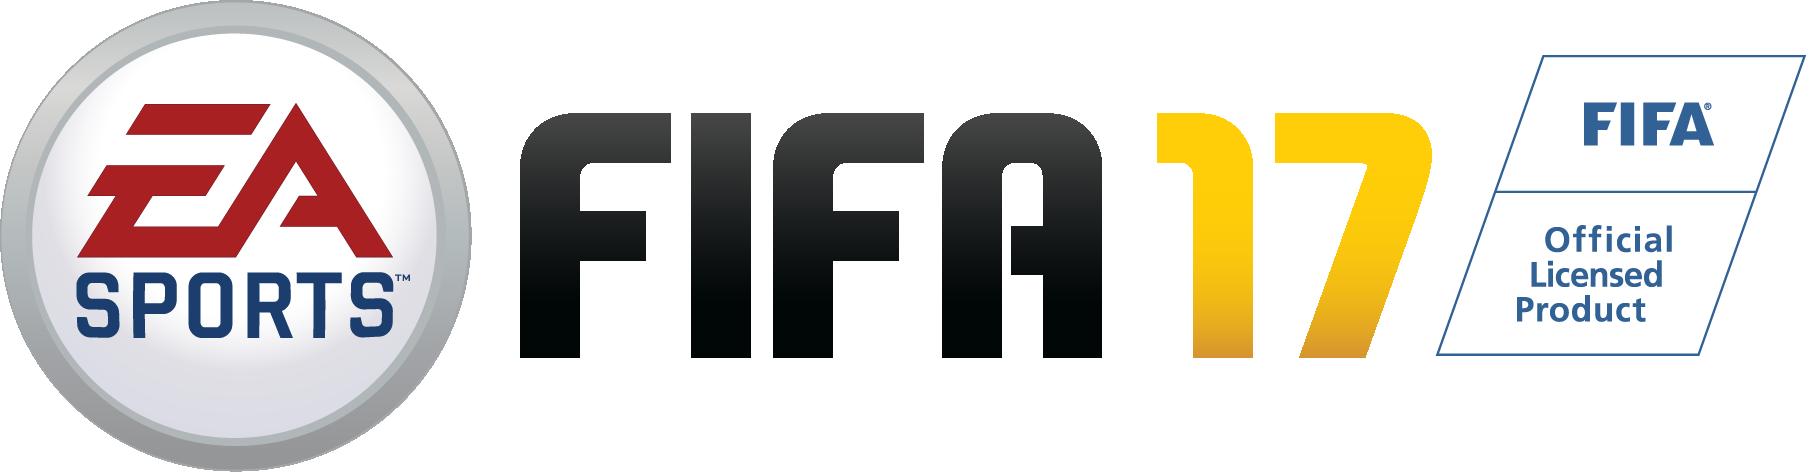 FIFA17goldlogoHORIZONTALrgb